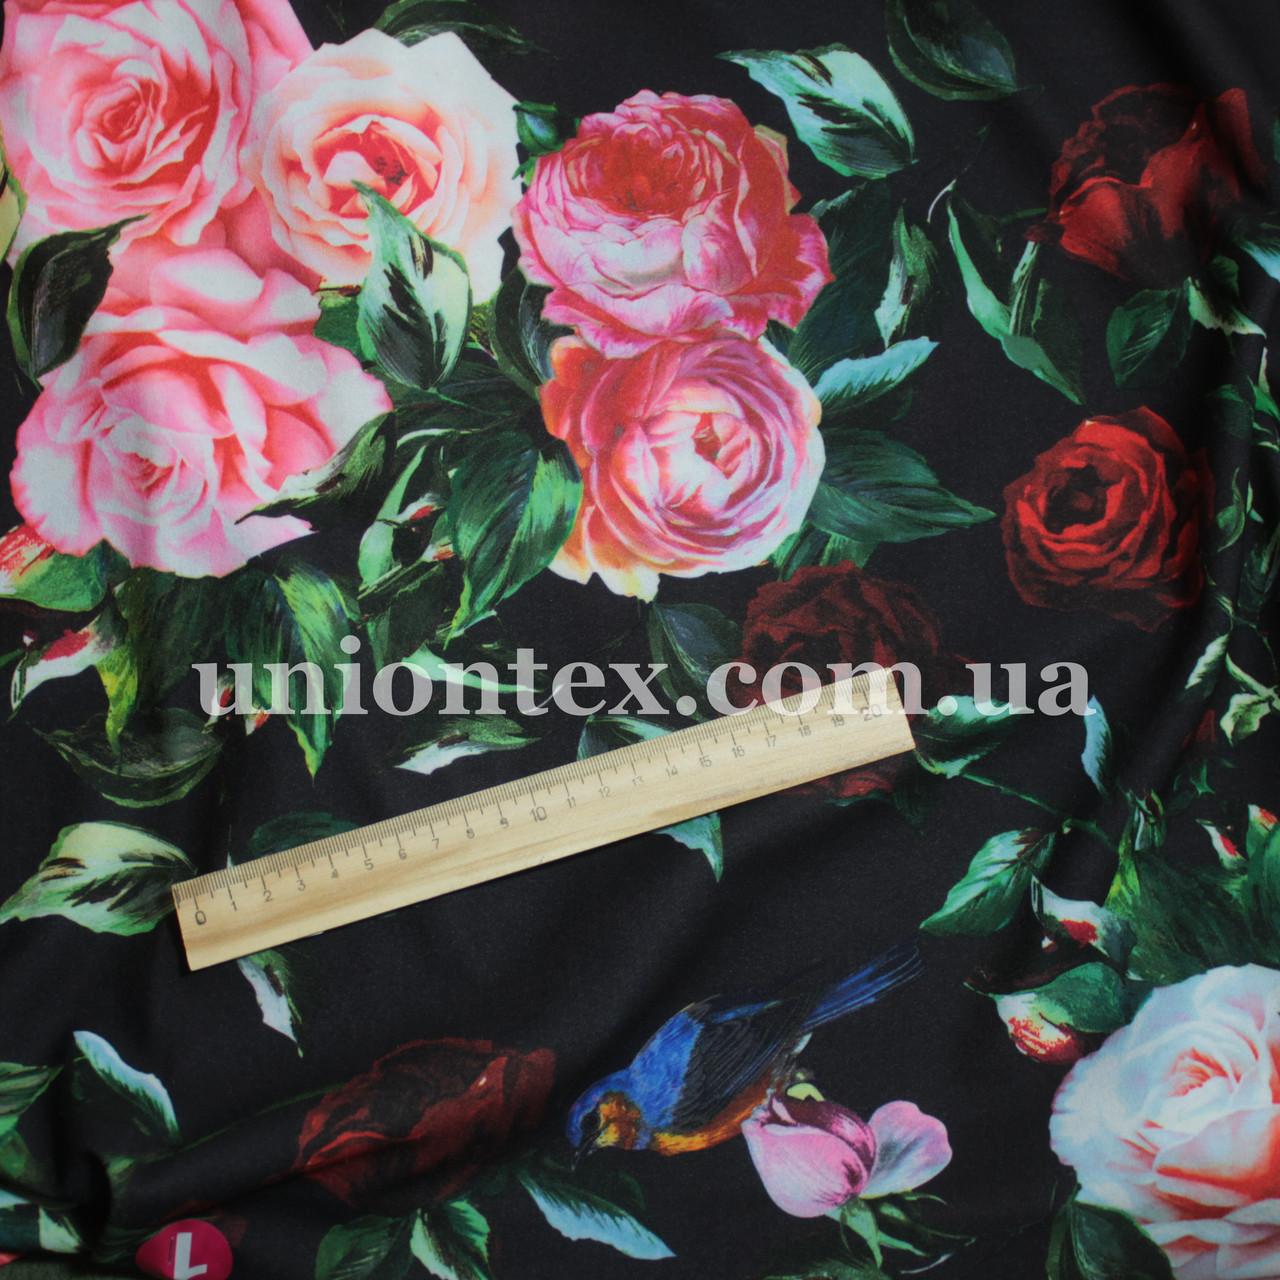 Креп- дайвинг трикотаж принт розы